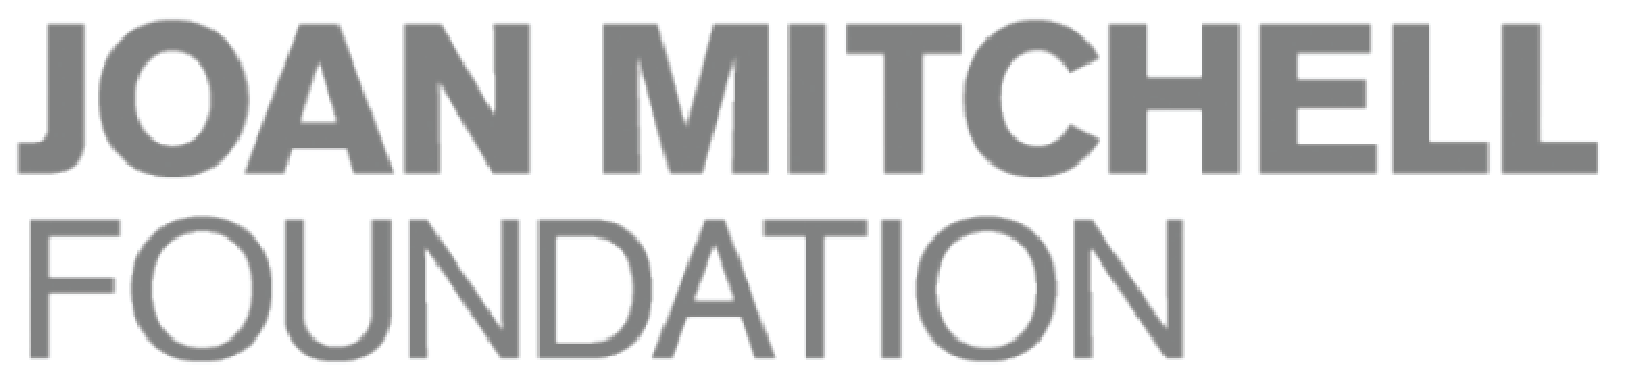 Joan Mitchell Foundation logo